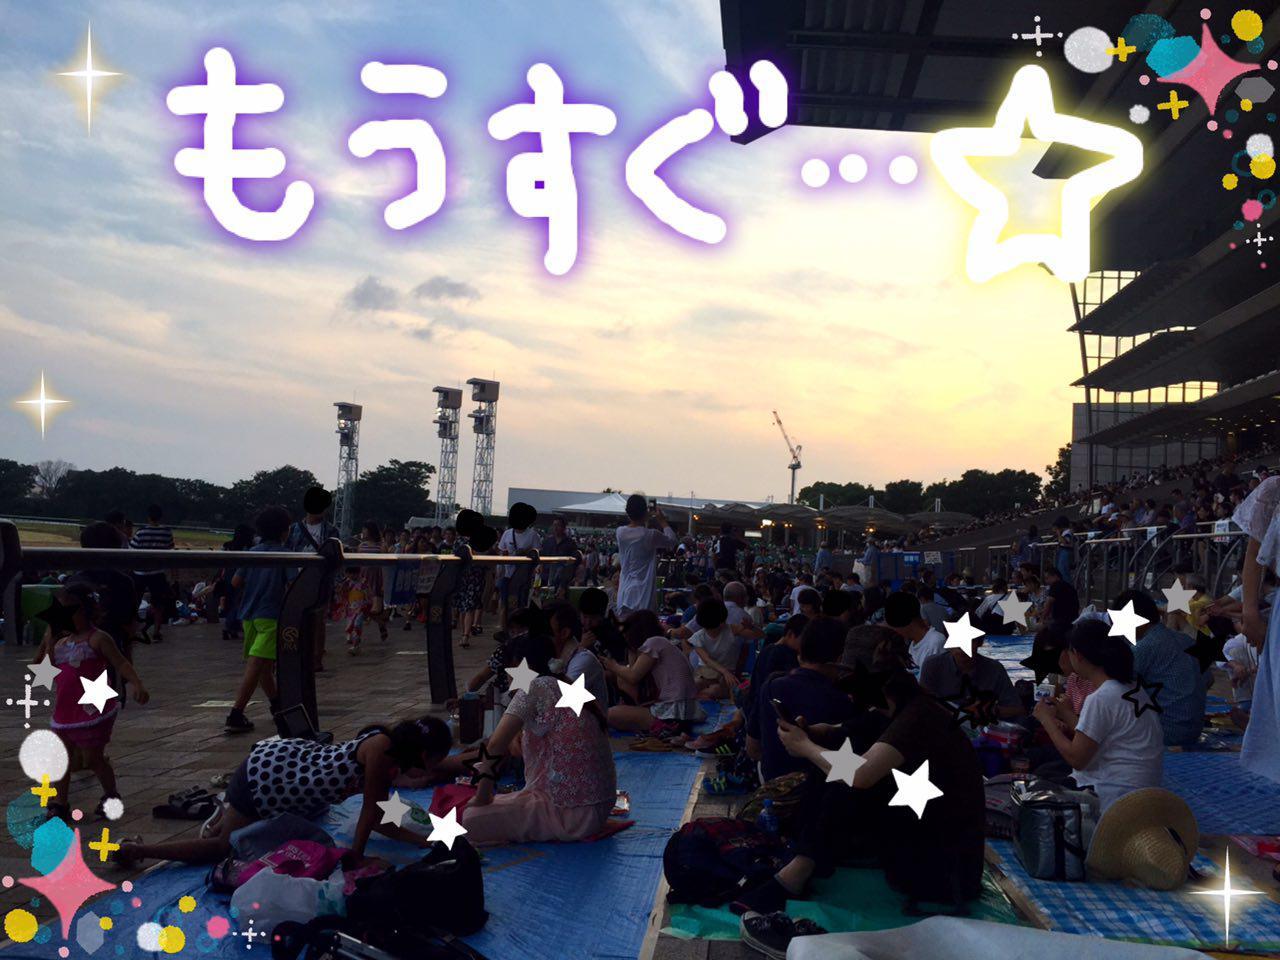 photo_2017-07-09_23-46-32.jpg